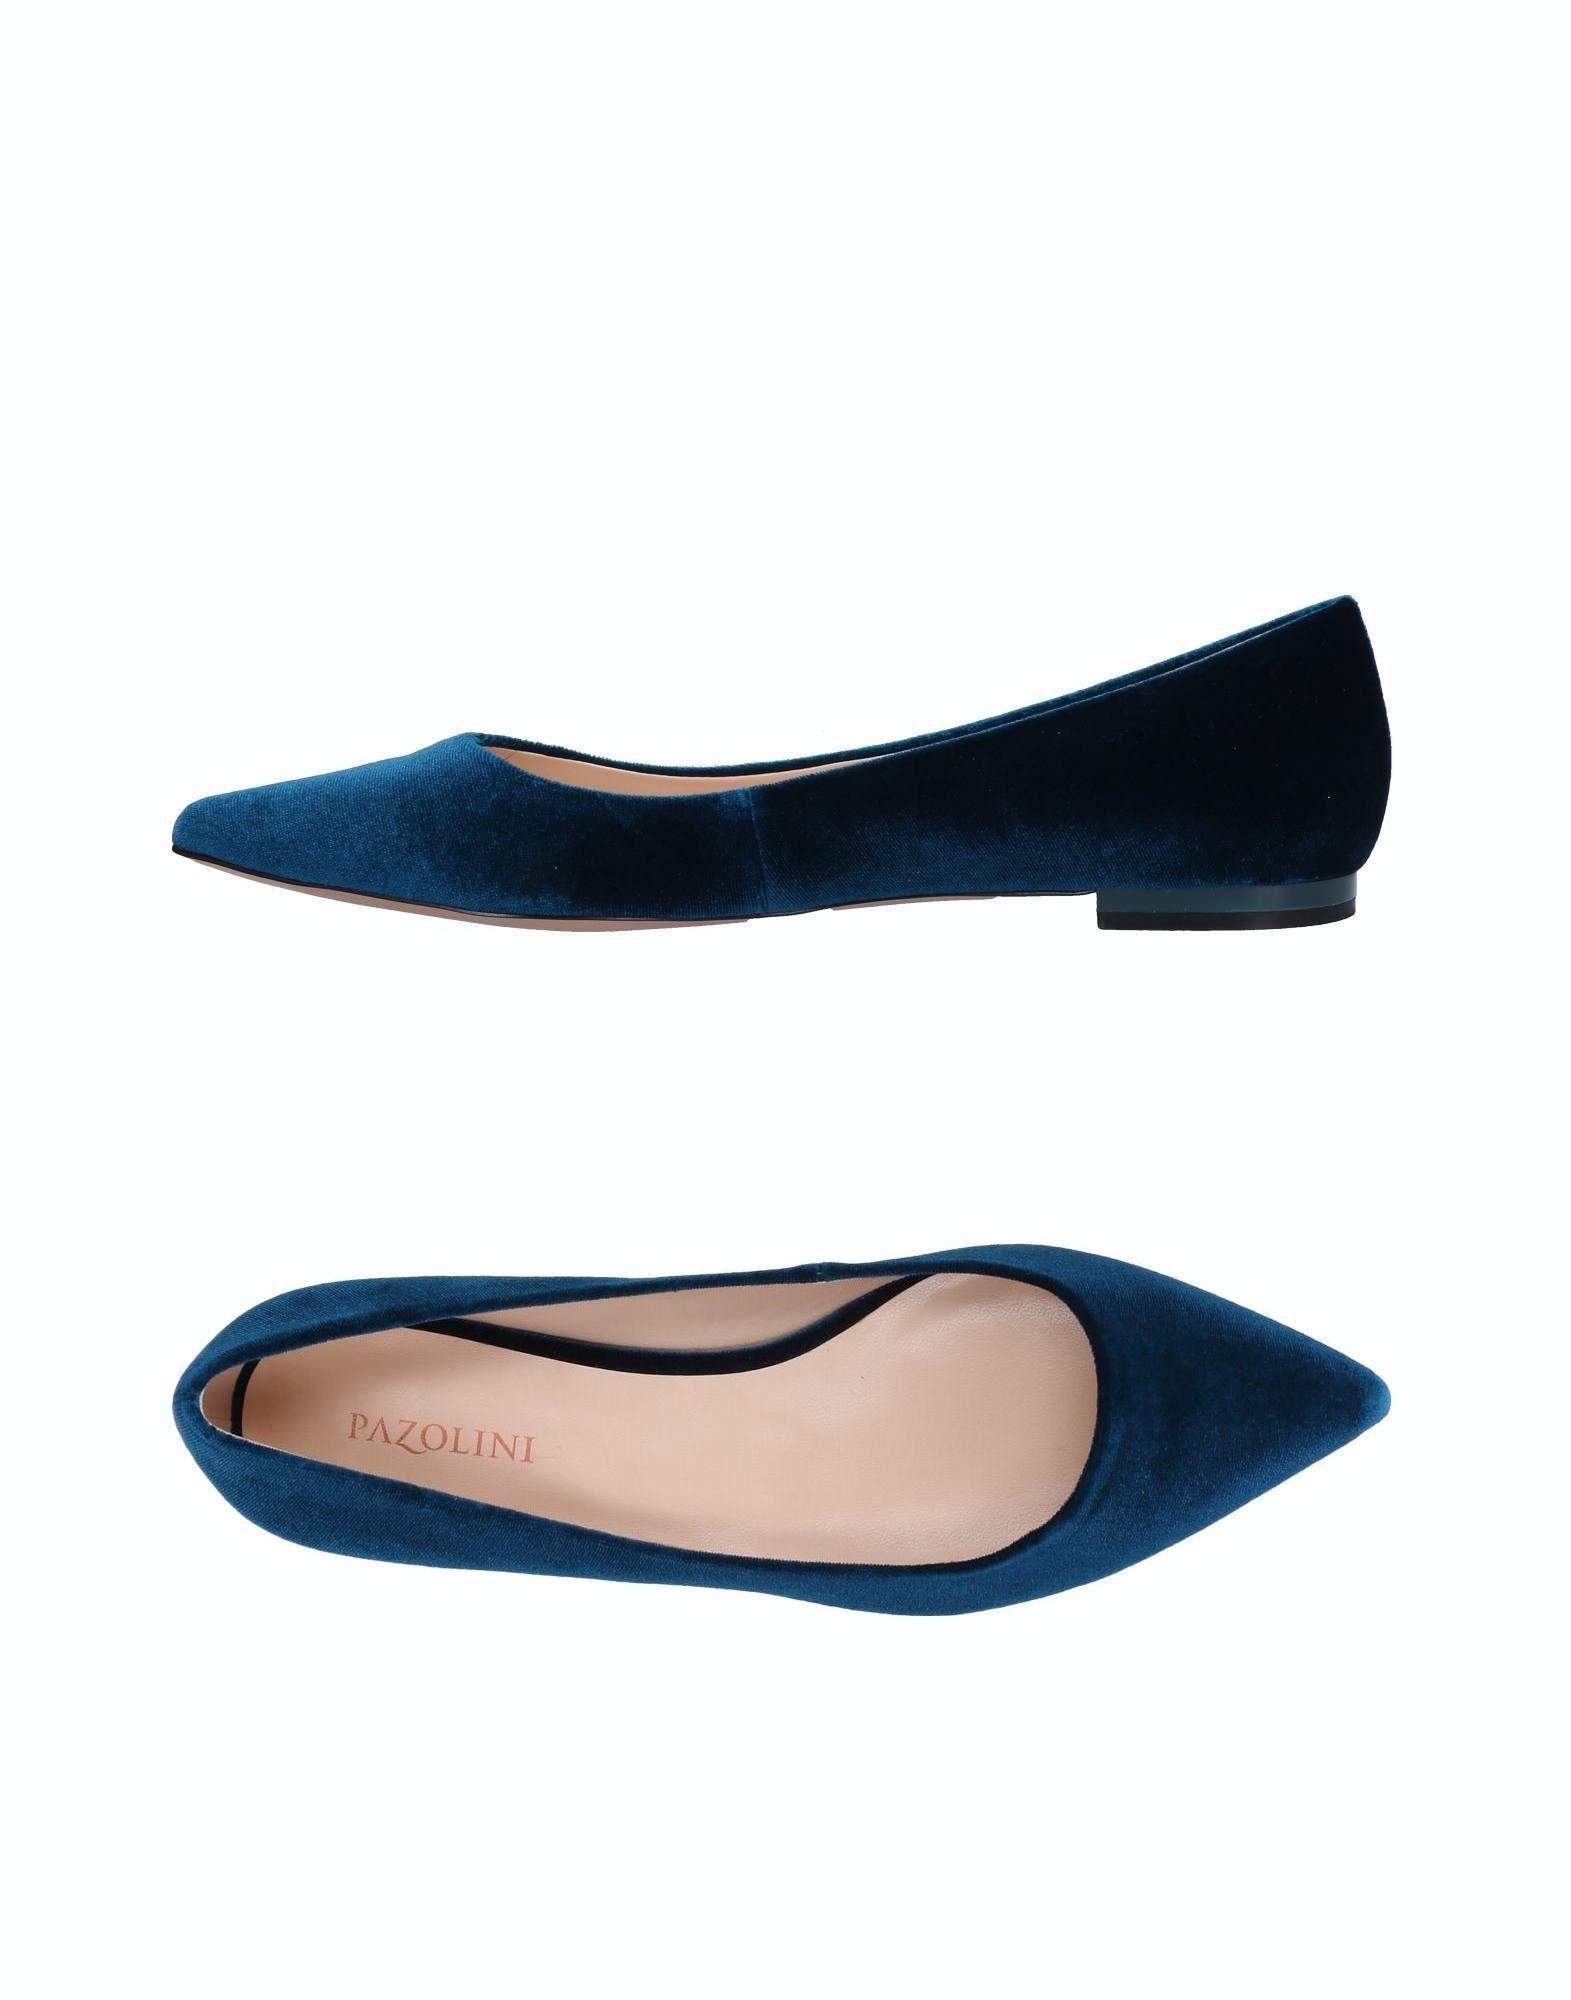 fc676c3bd Lyst - Carlo Pazolini Ballet Flats in Blue